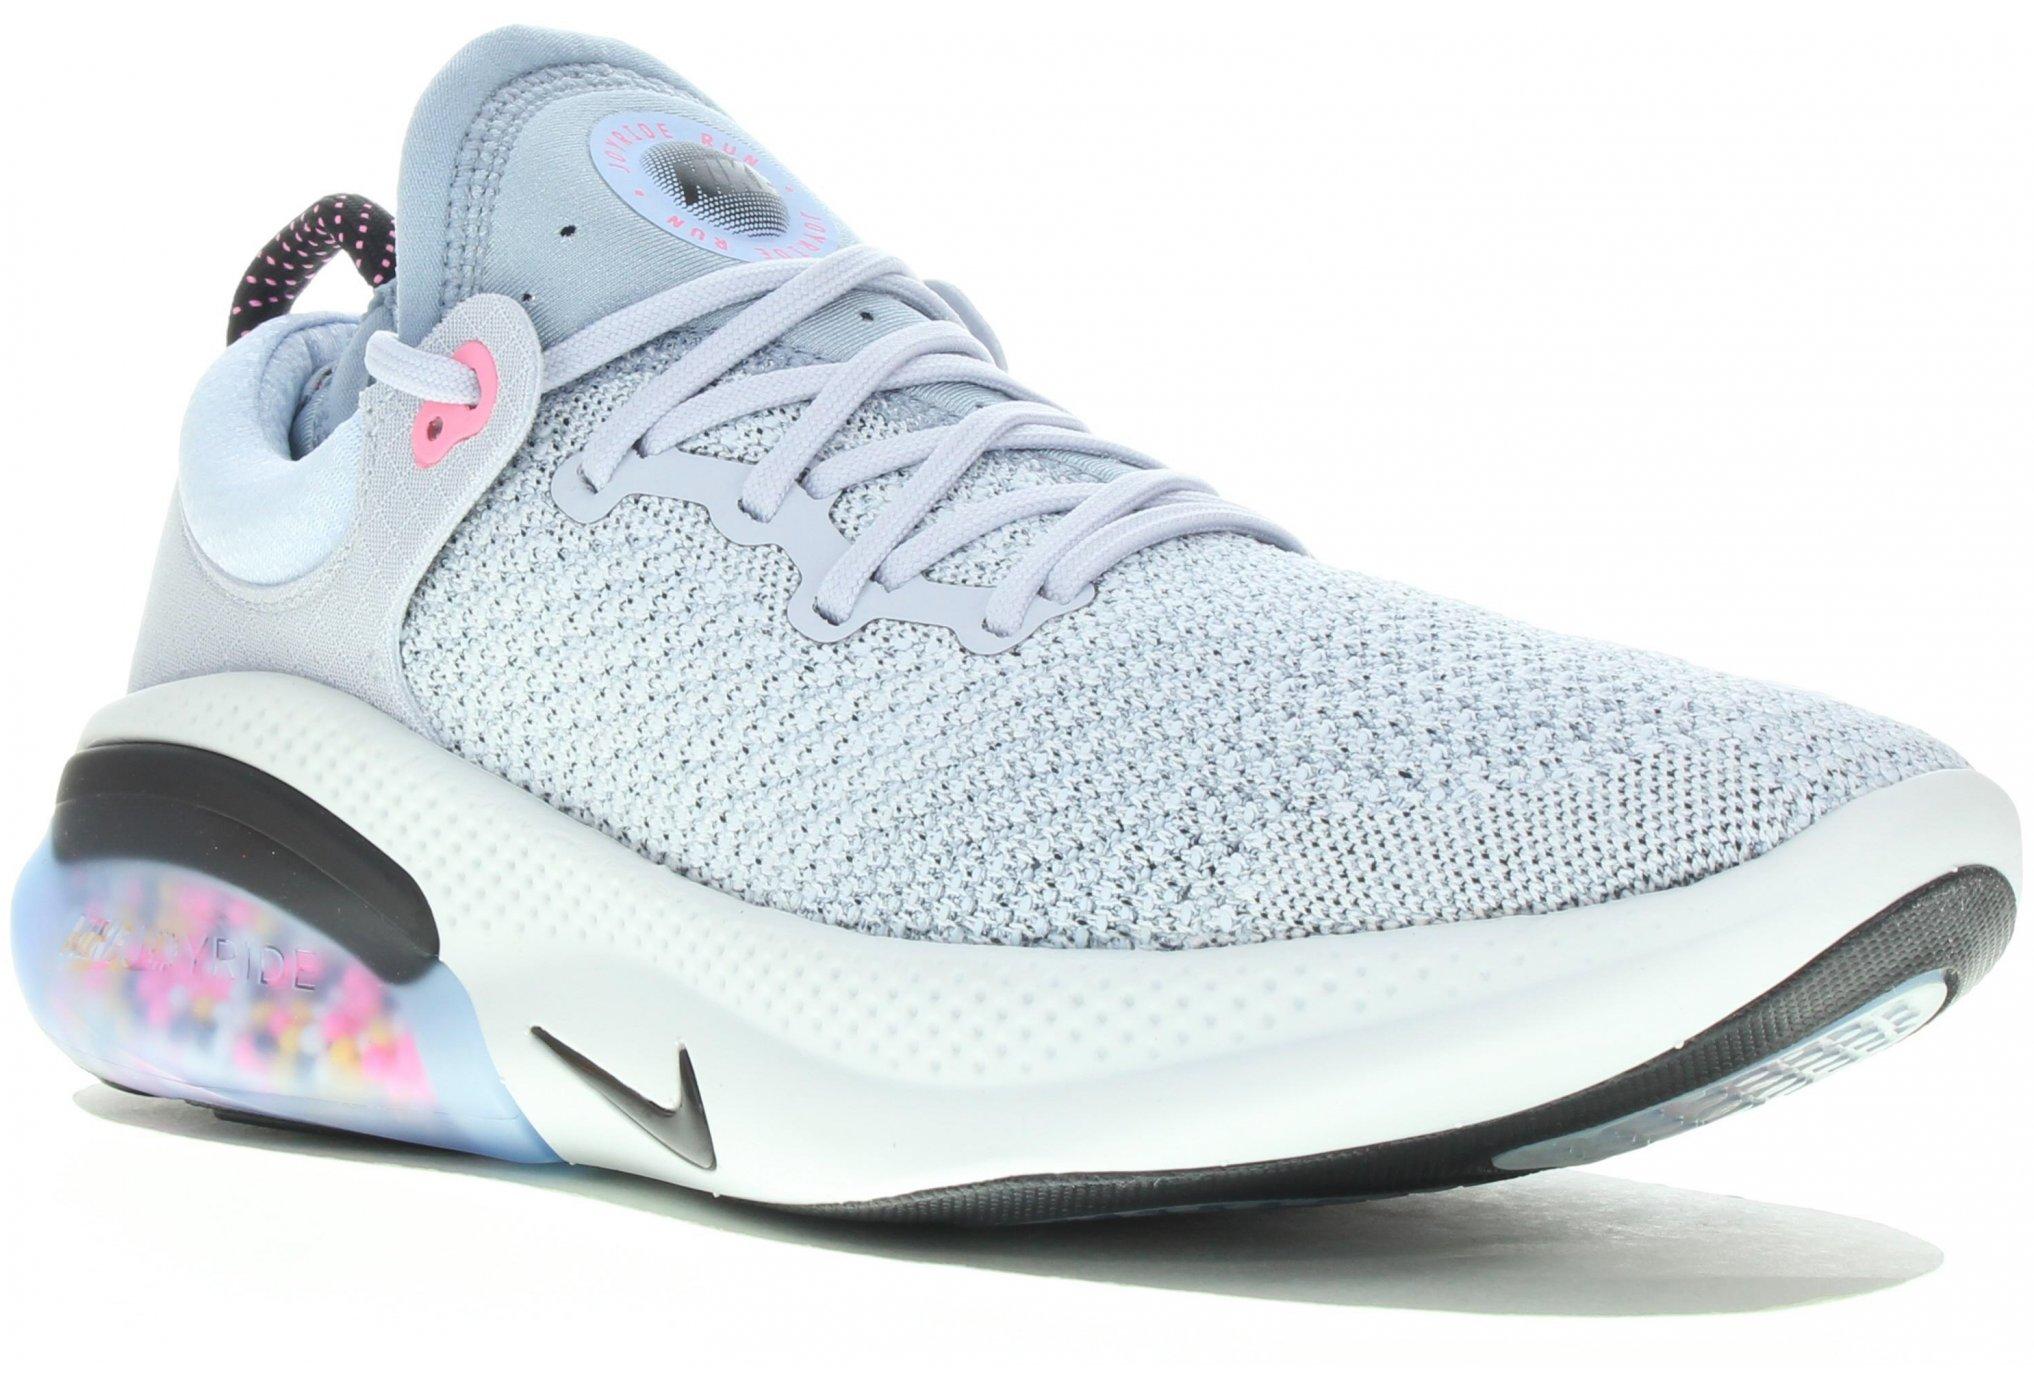 Nike Joyride Run Flyknit M Chaussures homme